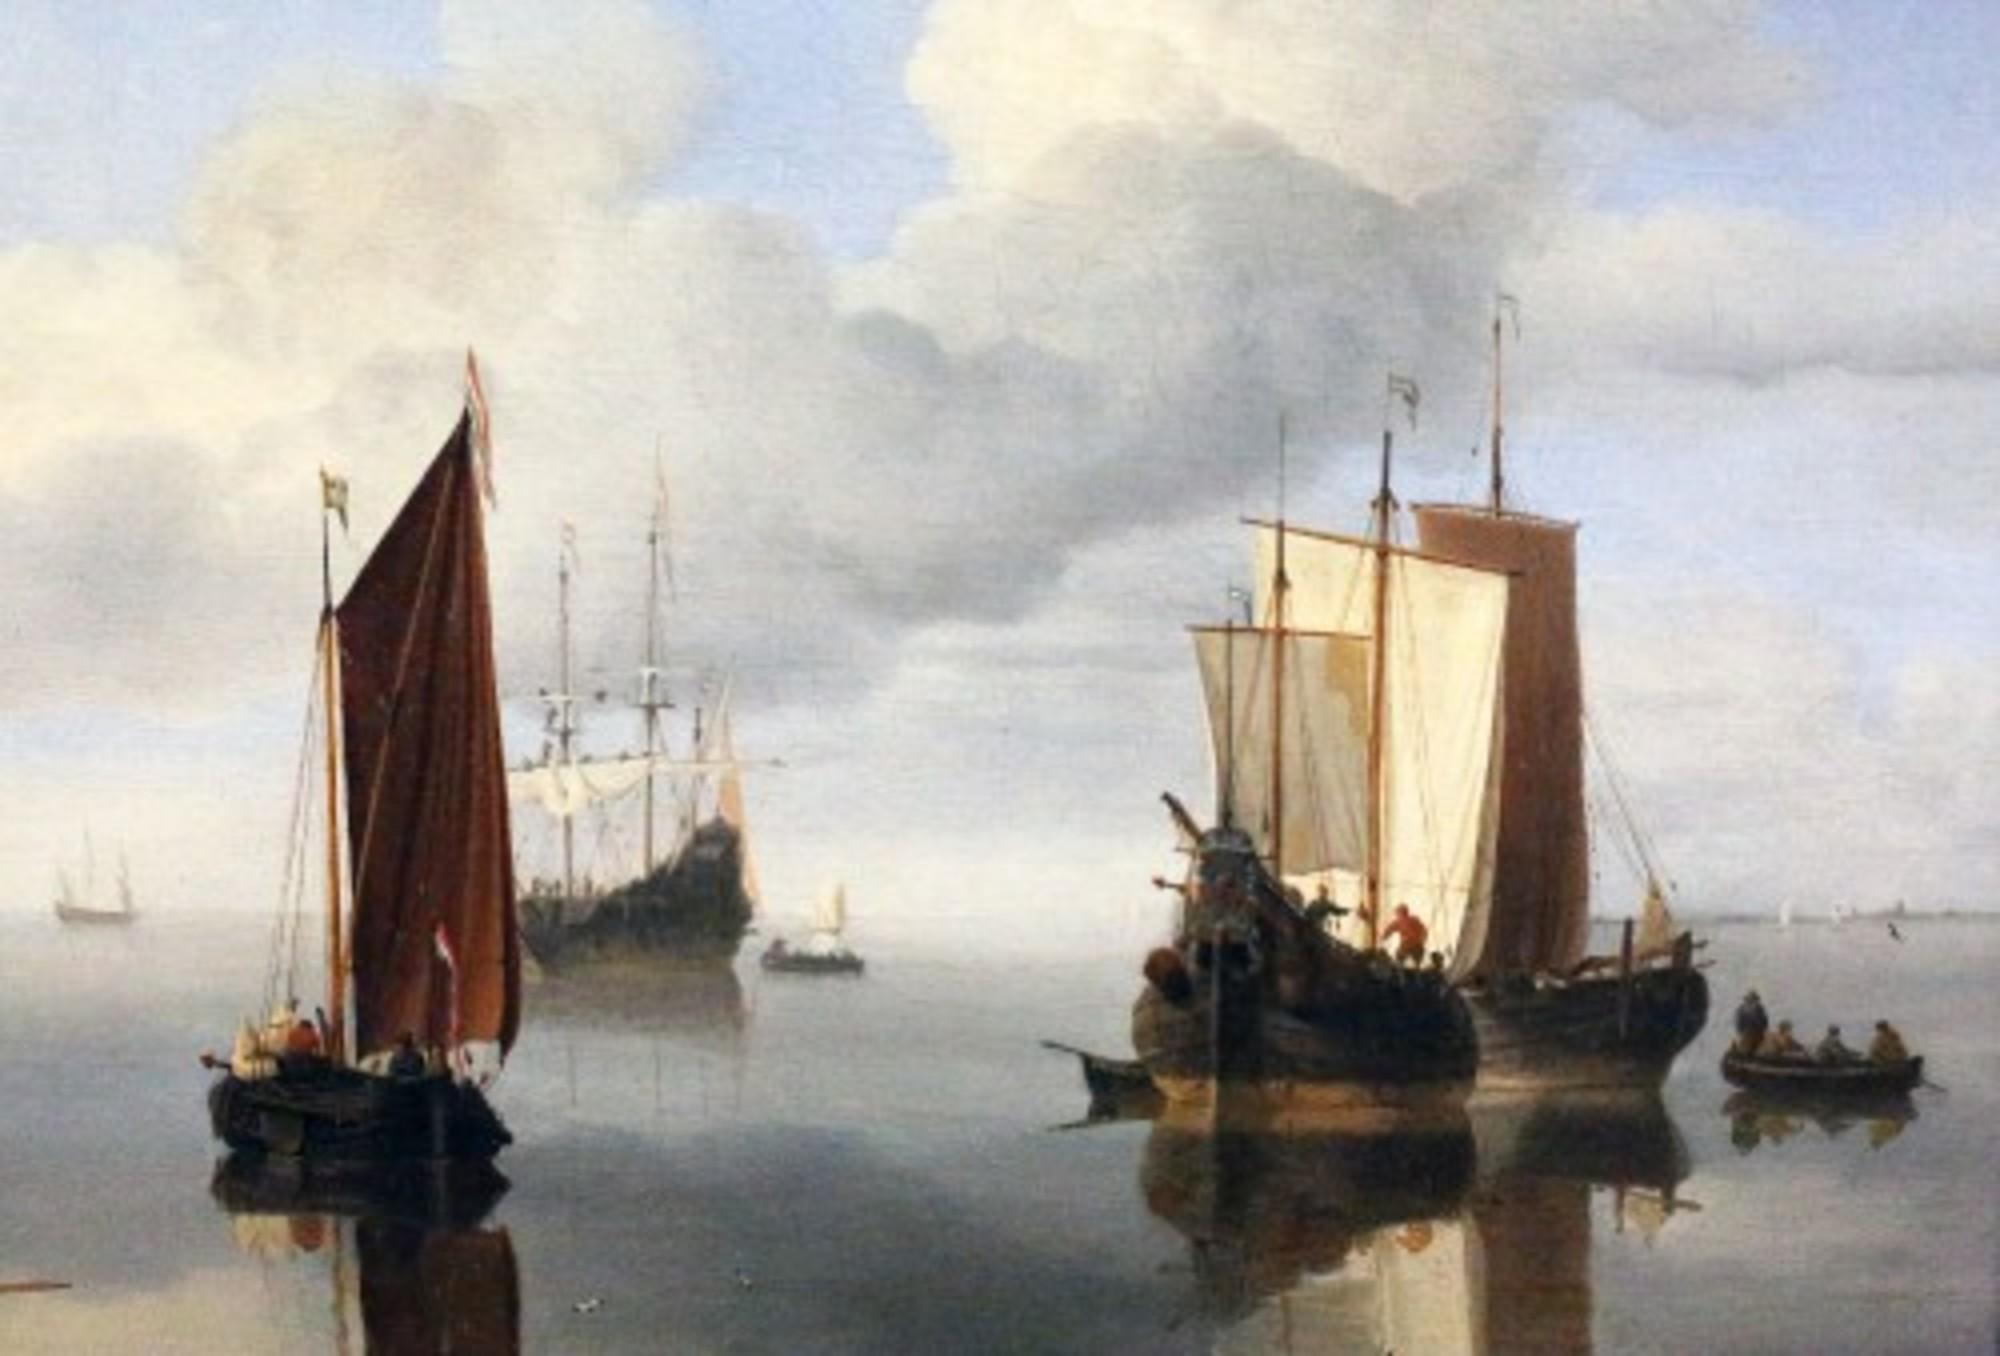 W-Van-De-Velde-Calm---Fishing-Boats-Under-Sail-1655-60-Wallace-Collection.jpg